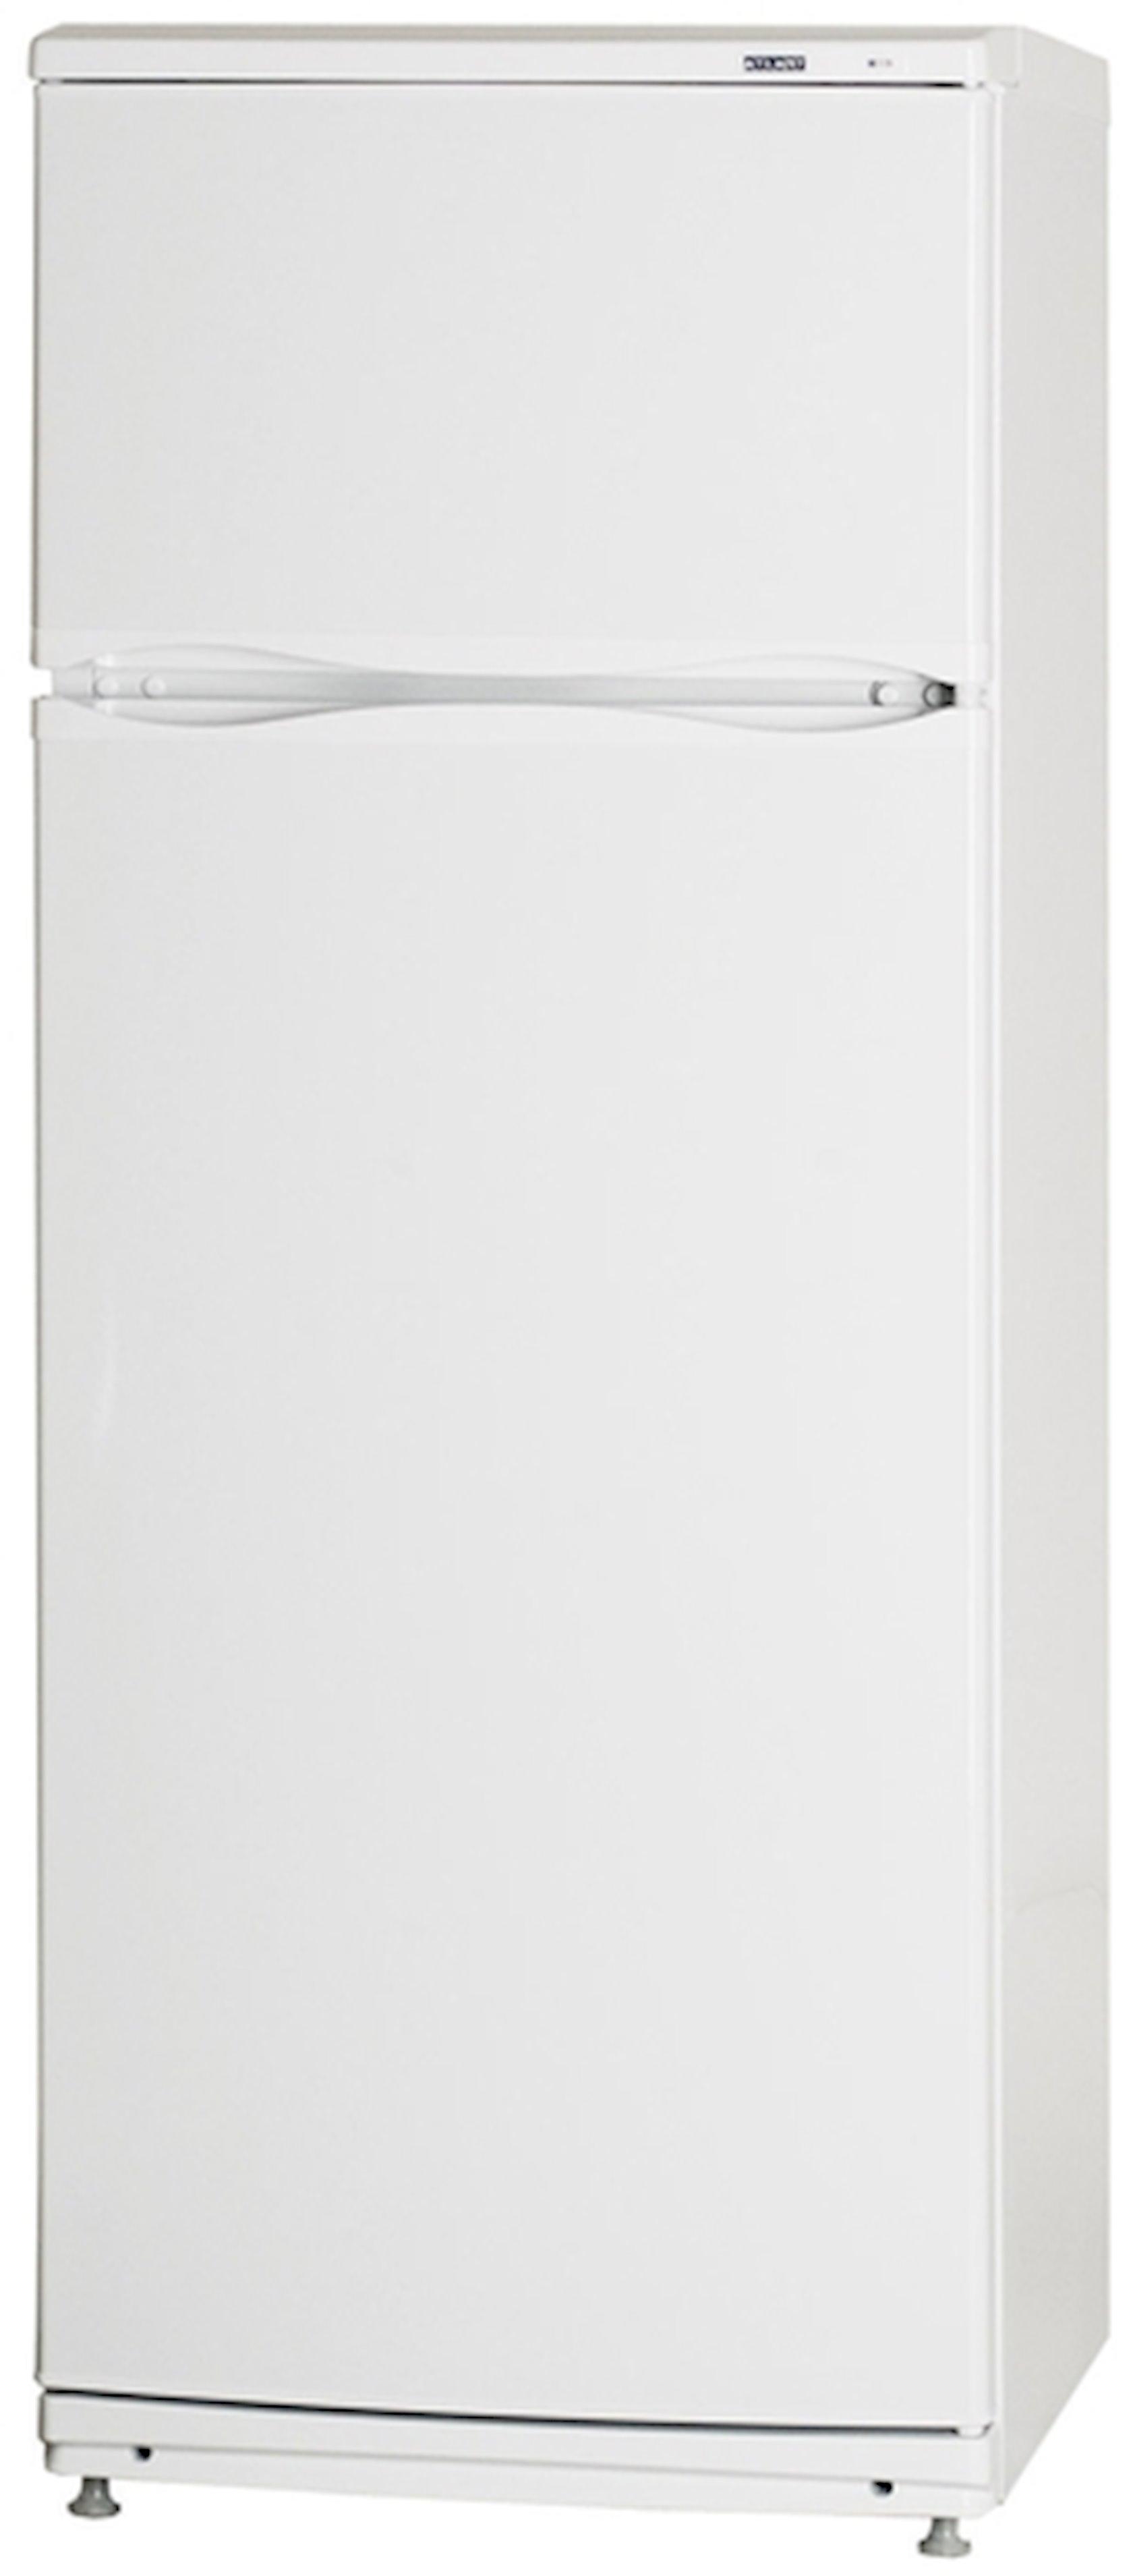 Soyuducu Атлант MXM 2808-90 White